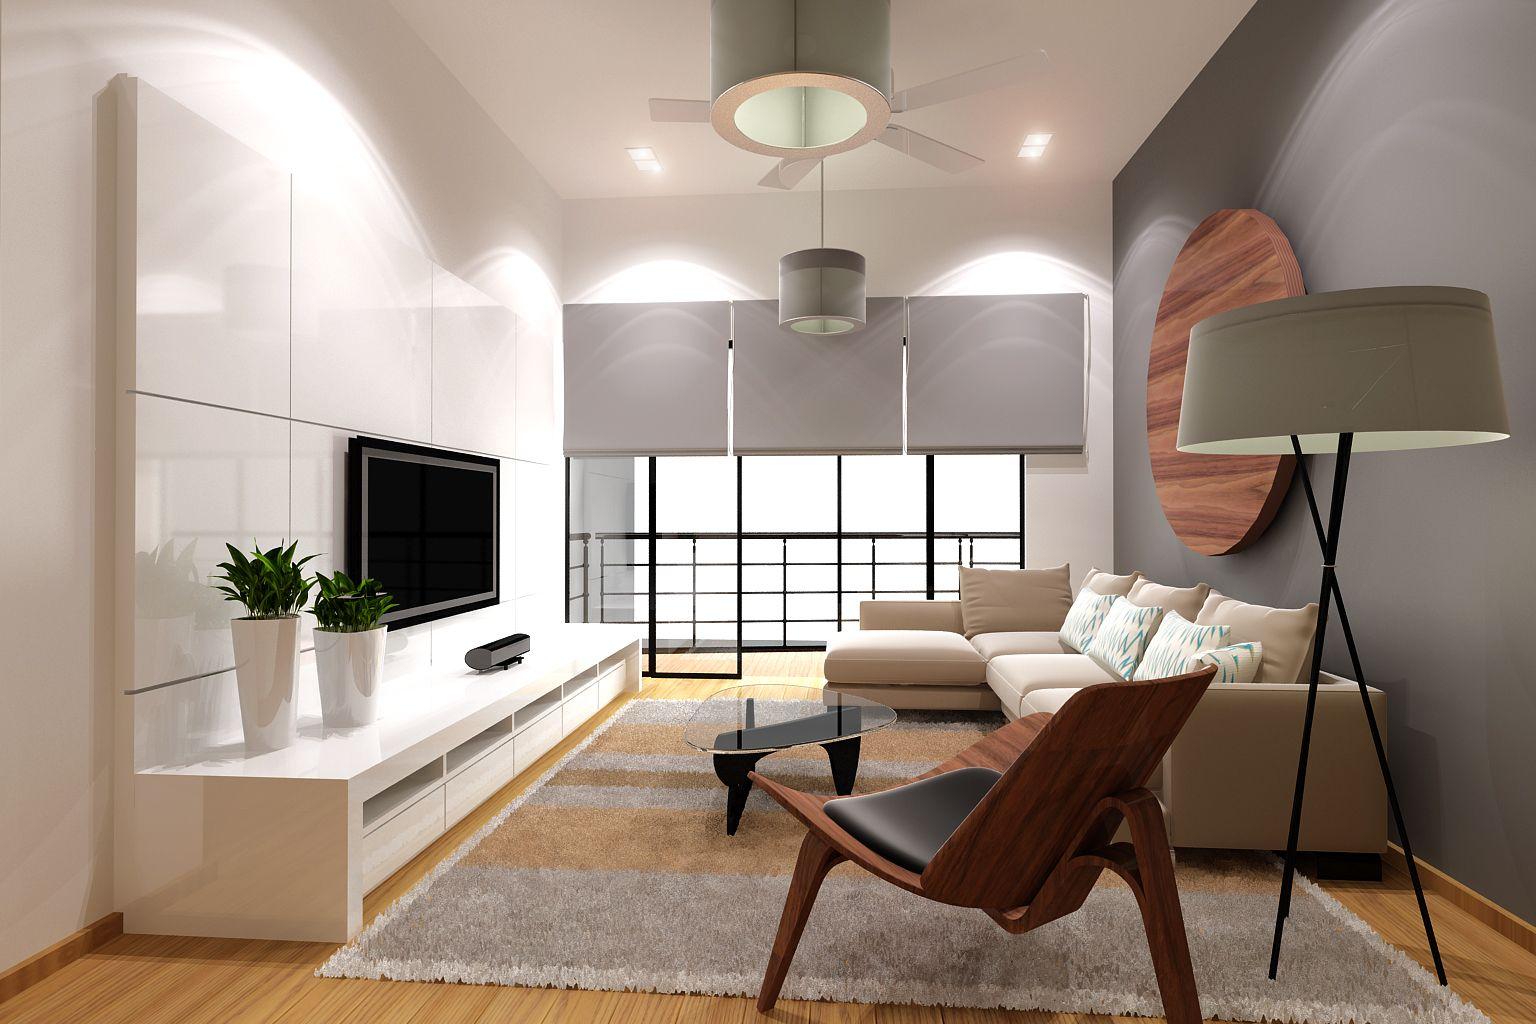 SARANG INTERIORS: INTERIOR DESIGN- ZEN & MINIMALIST ... on condo in hanger design, beach condo design, contemporary condo design, modern condo design, condo interior design,